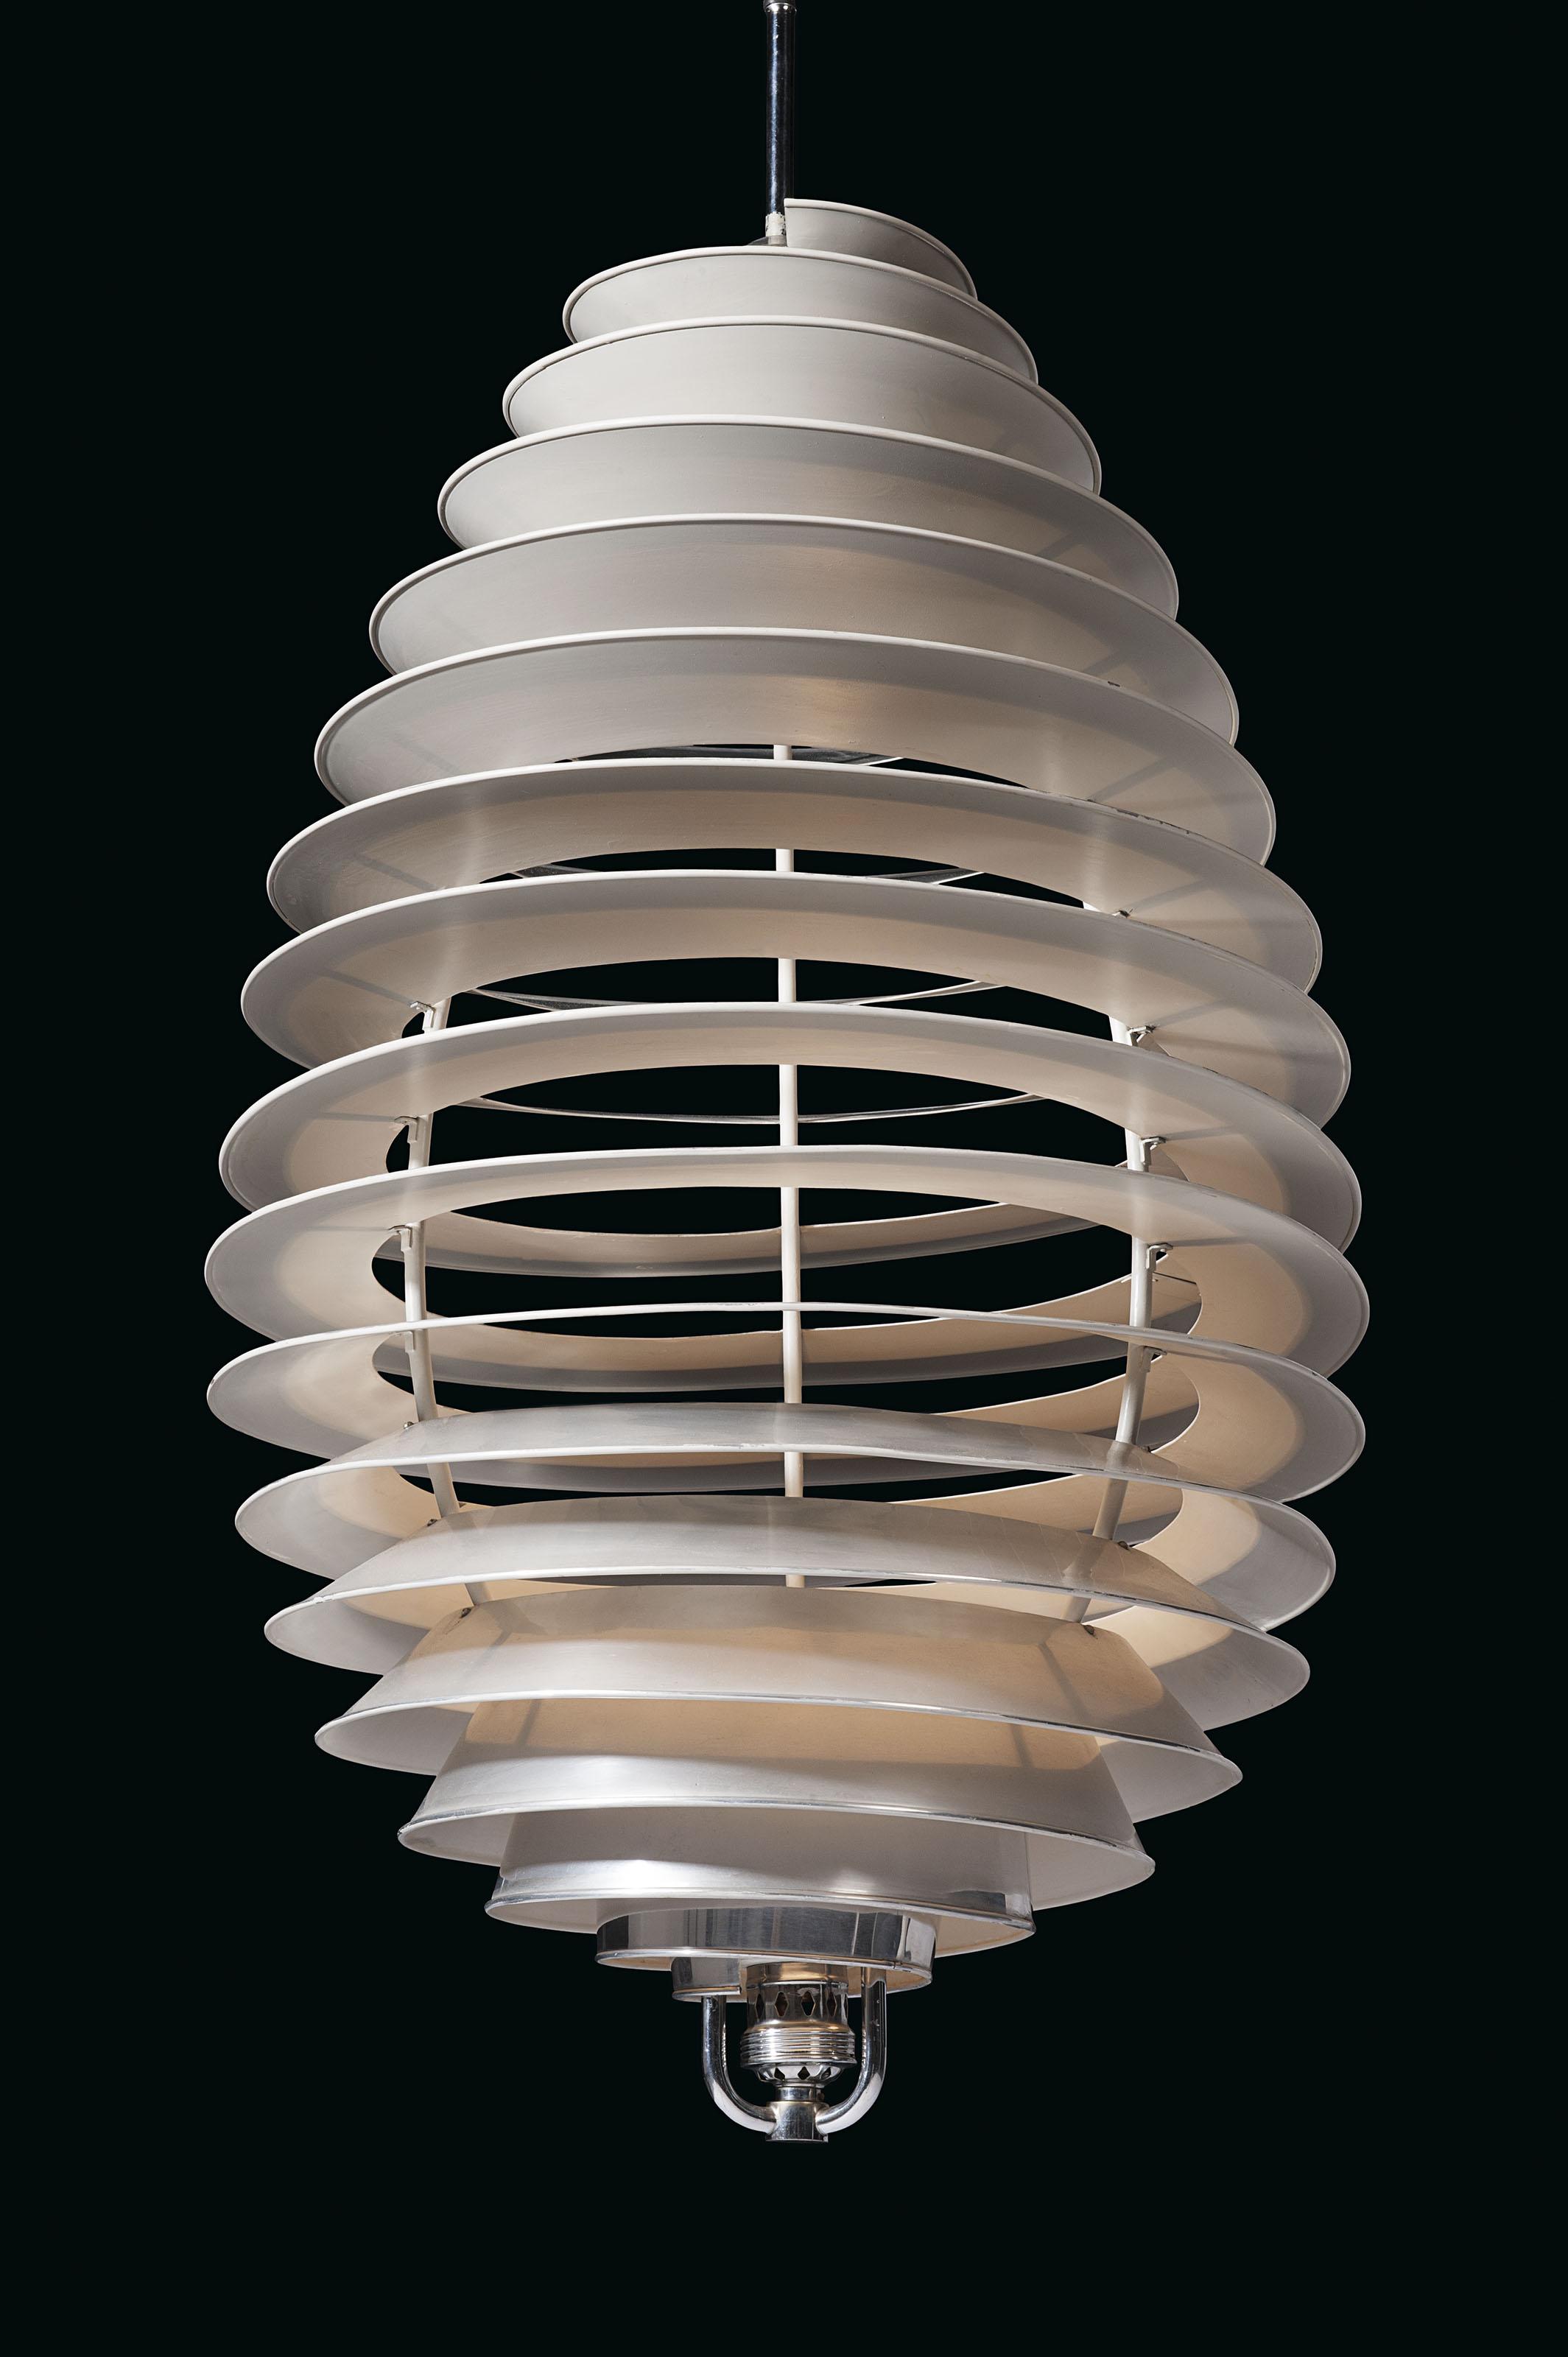 A rare 'Spiral' ceiling light